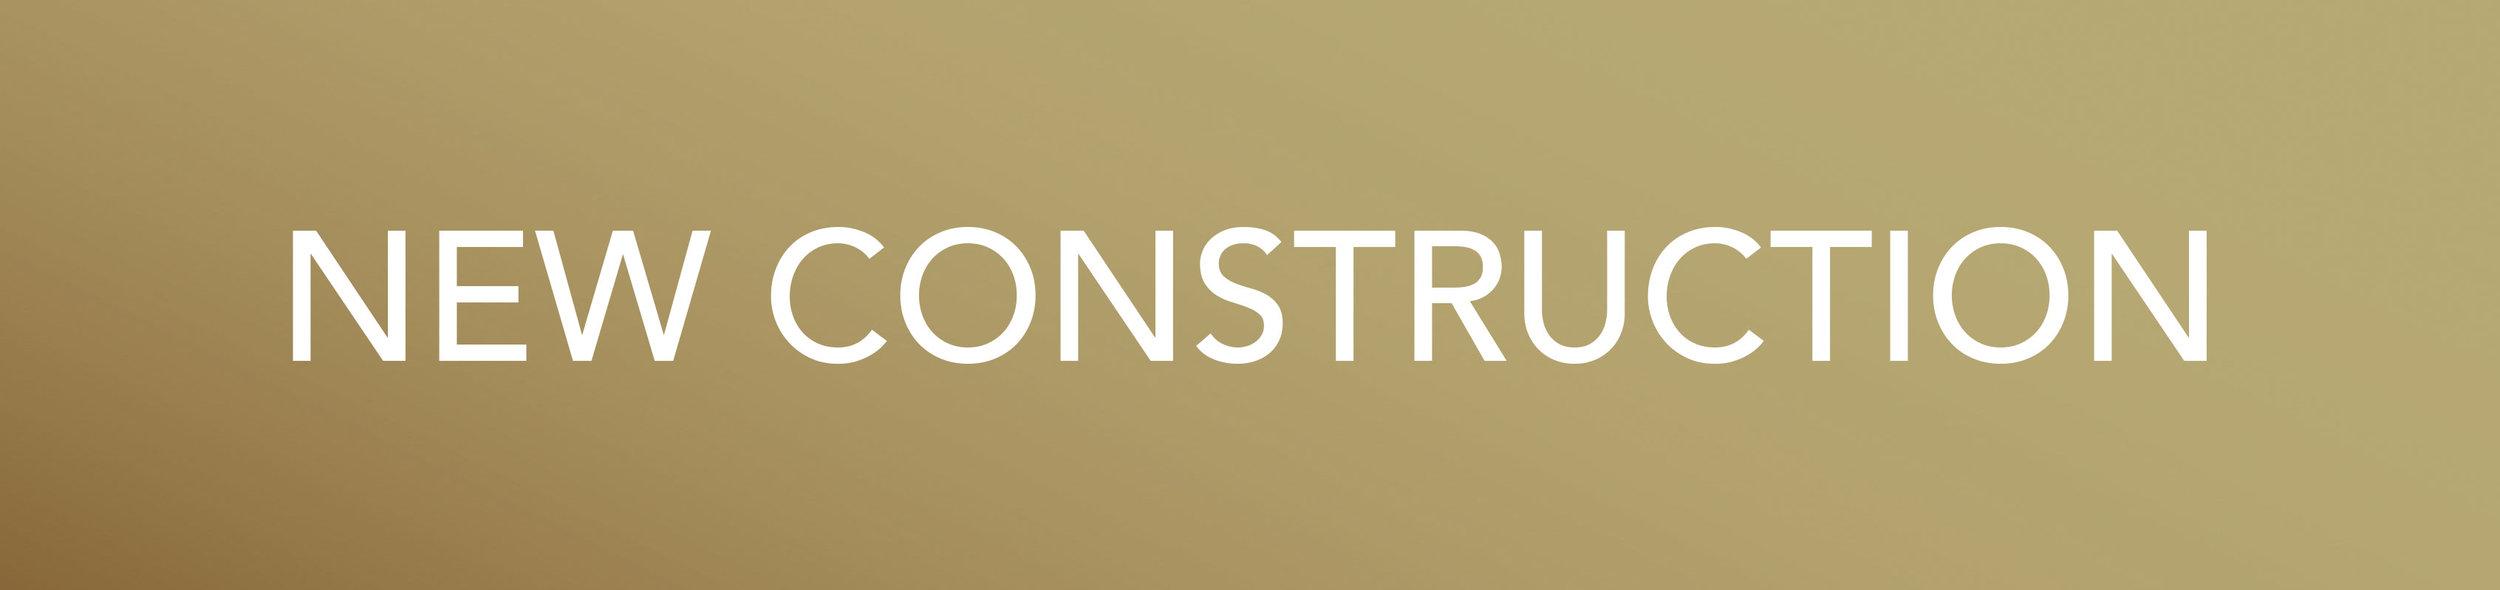 new_construction.jpg